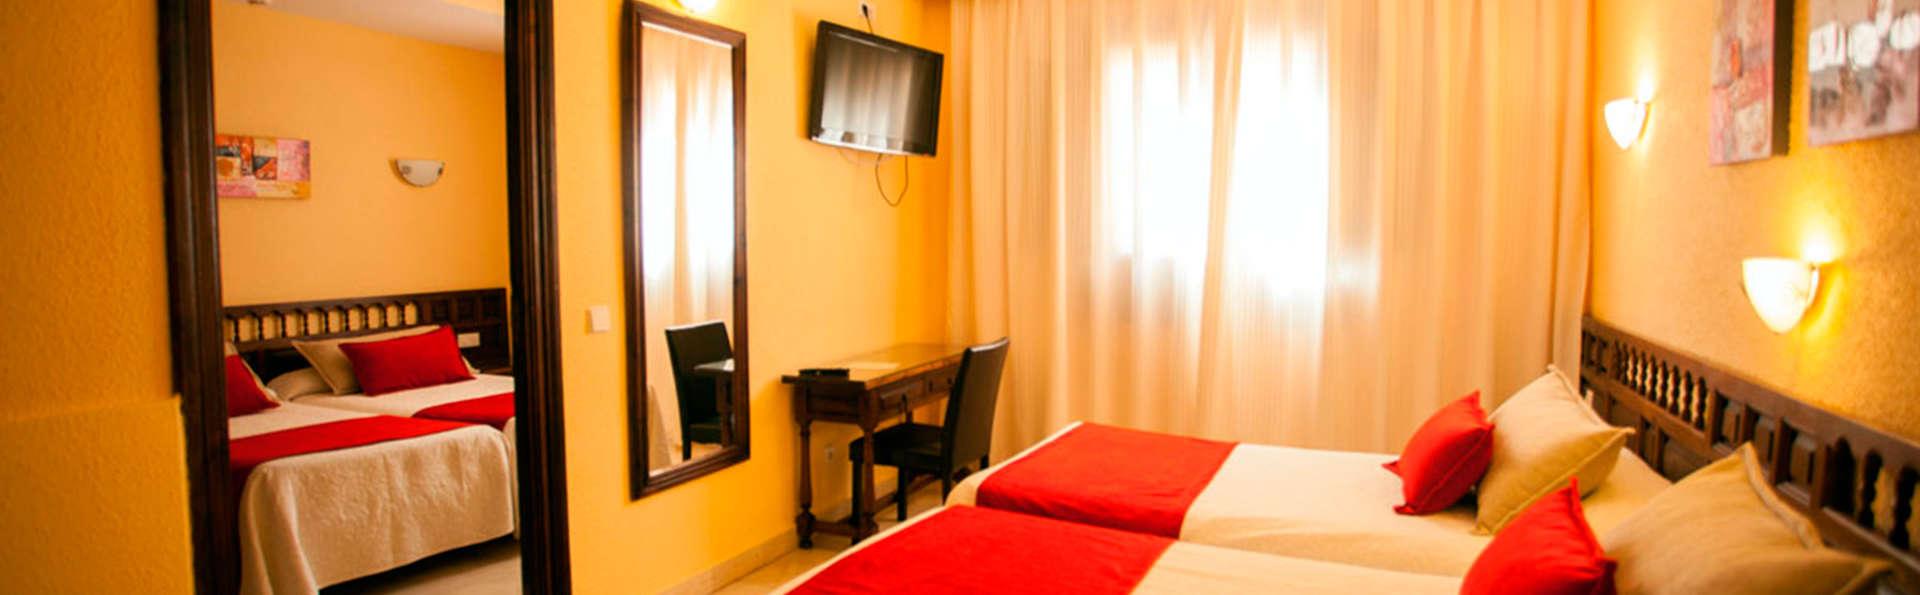 Hotel Sercotel Alfonso VI - EDIT_room2.jpg